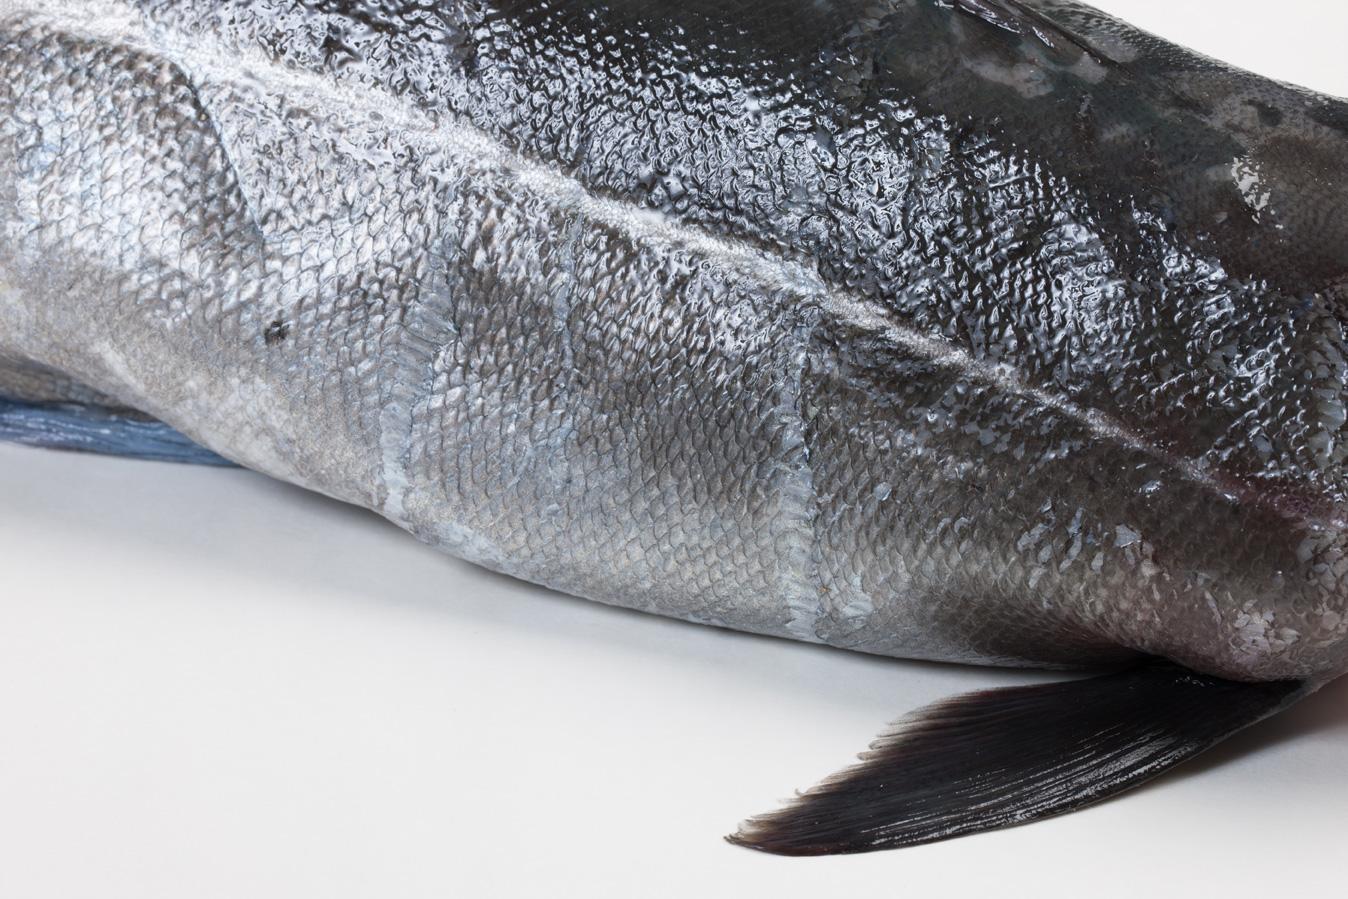 Groothandel-vis-FishXL-vis-kabeljauw_WL_9550